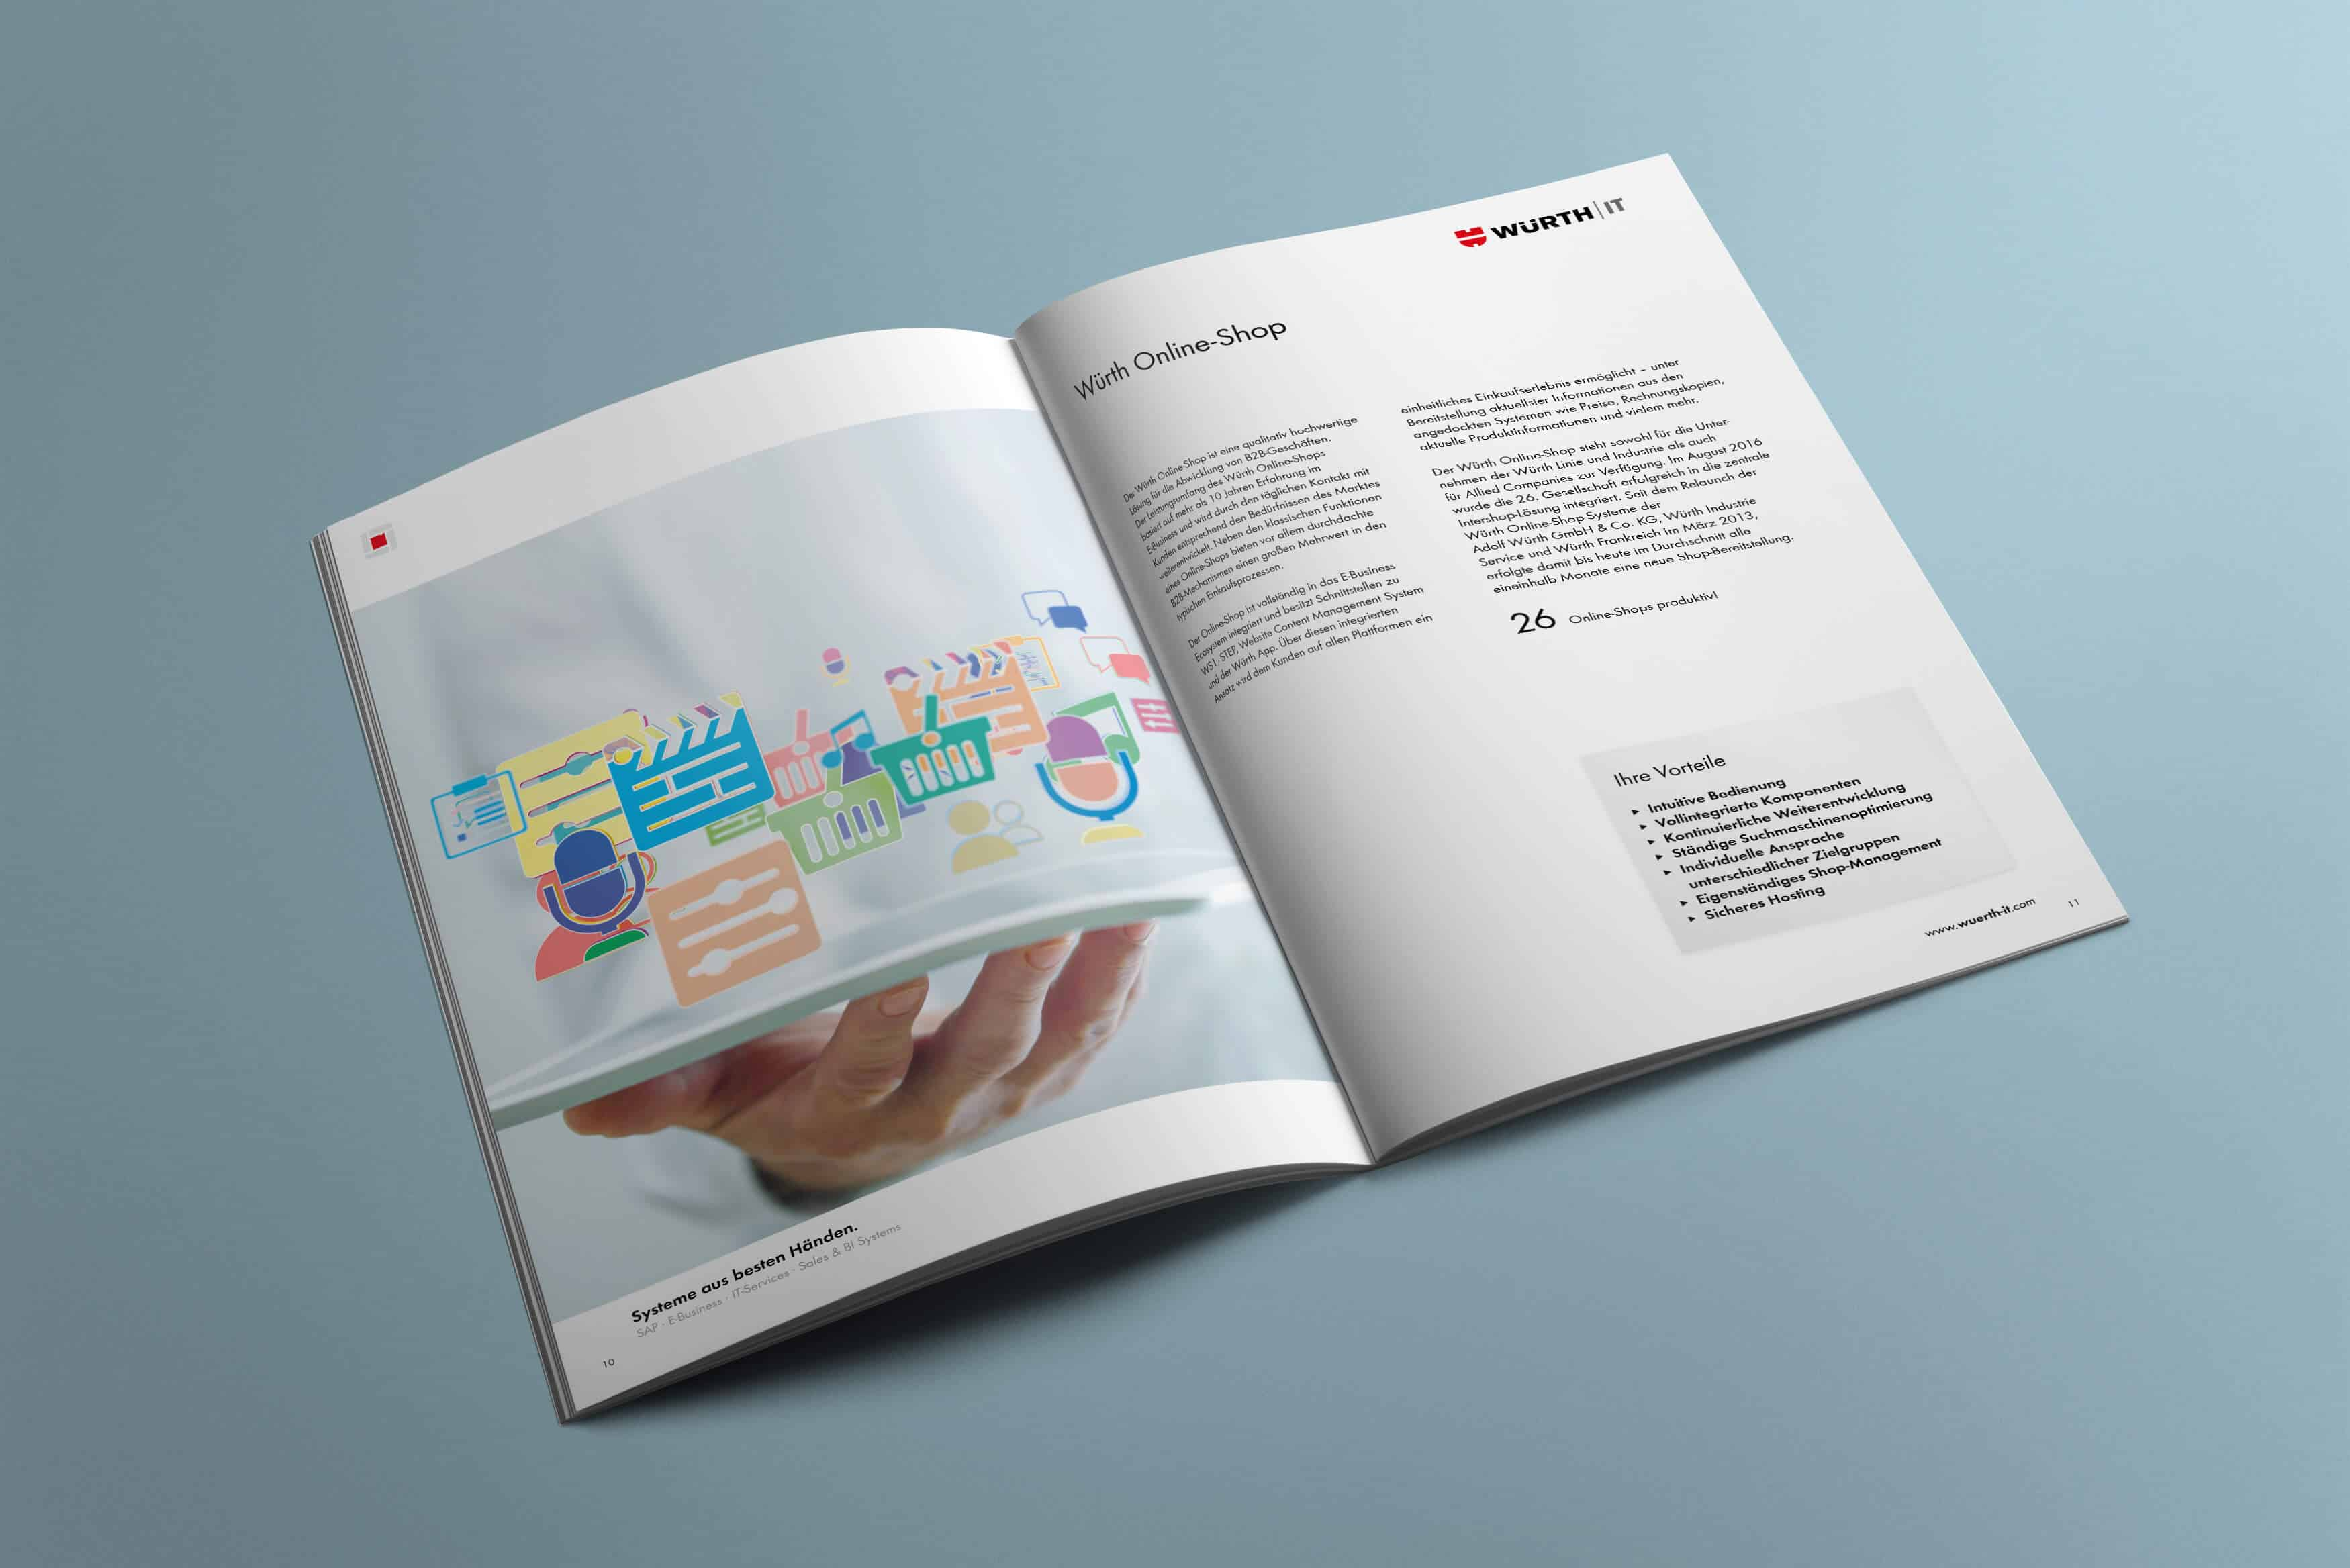 WUERTHIT-E-Business-Grow12_LIT-6-perspektive-color klassische-werbung-referenz